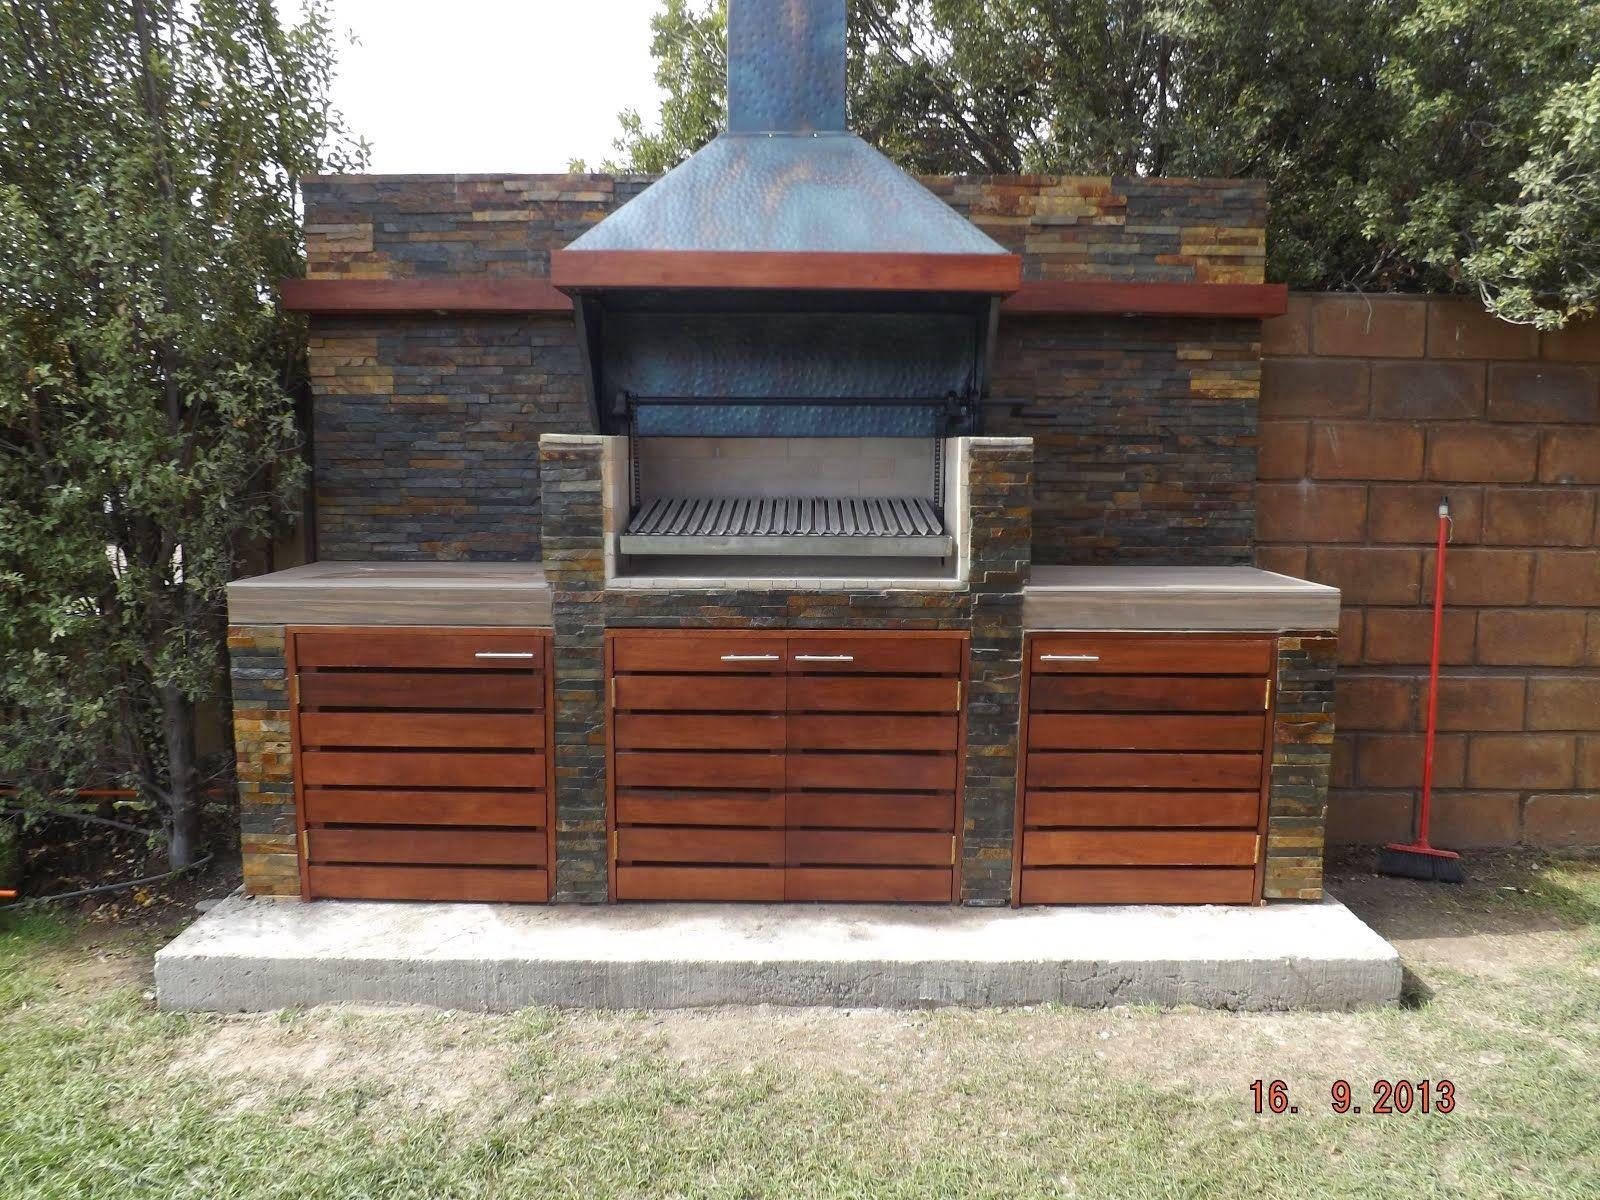 Quincho rquinteros churrasquera pinterest barbacoa patios and